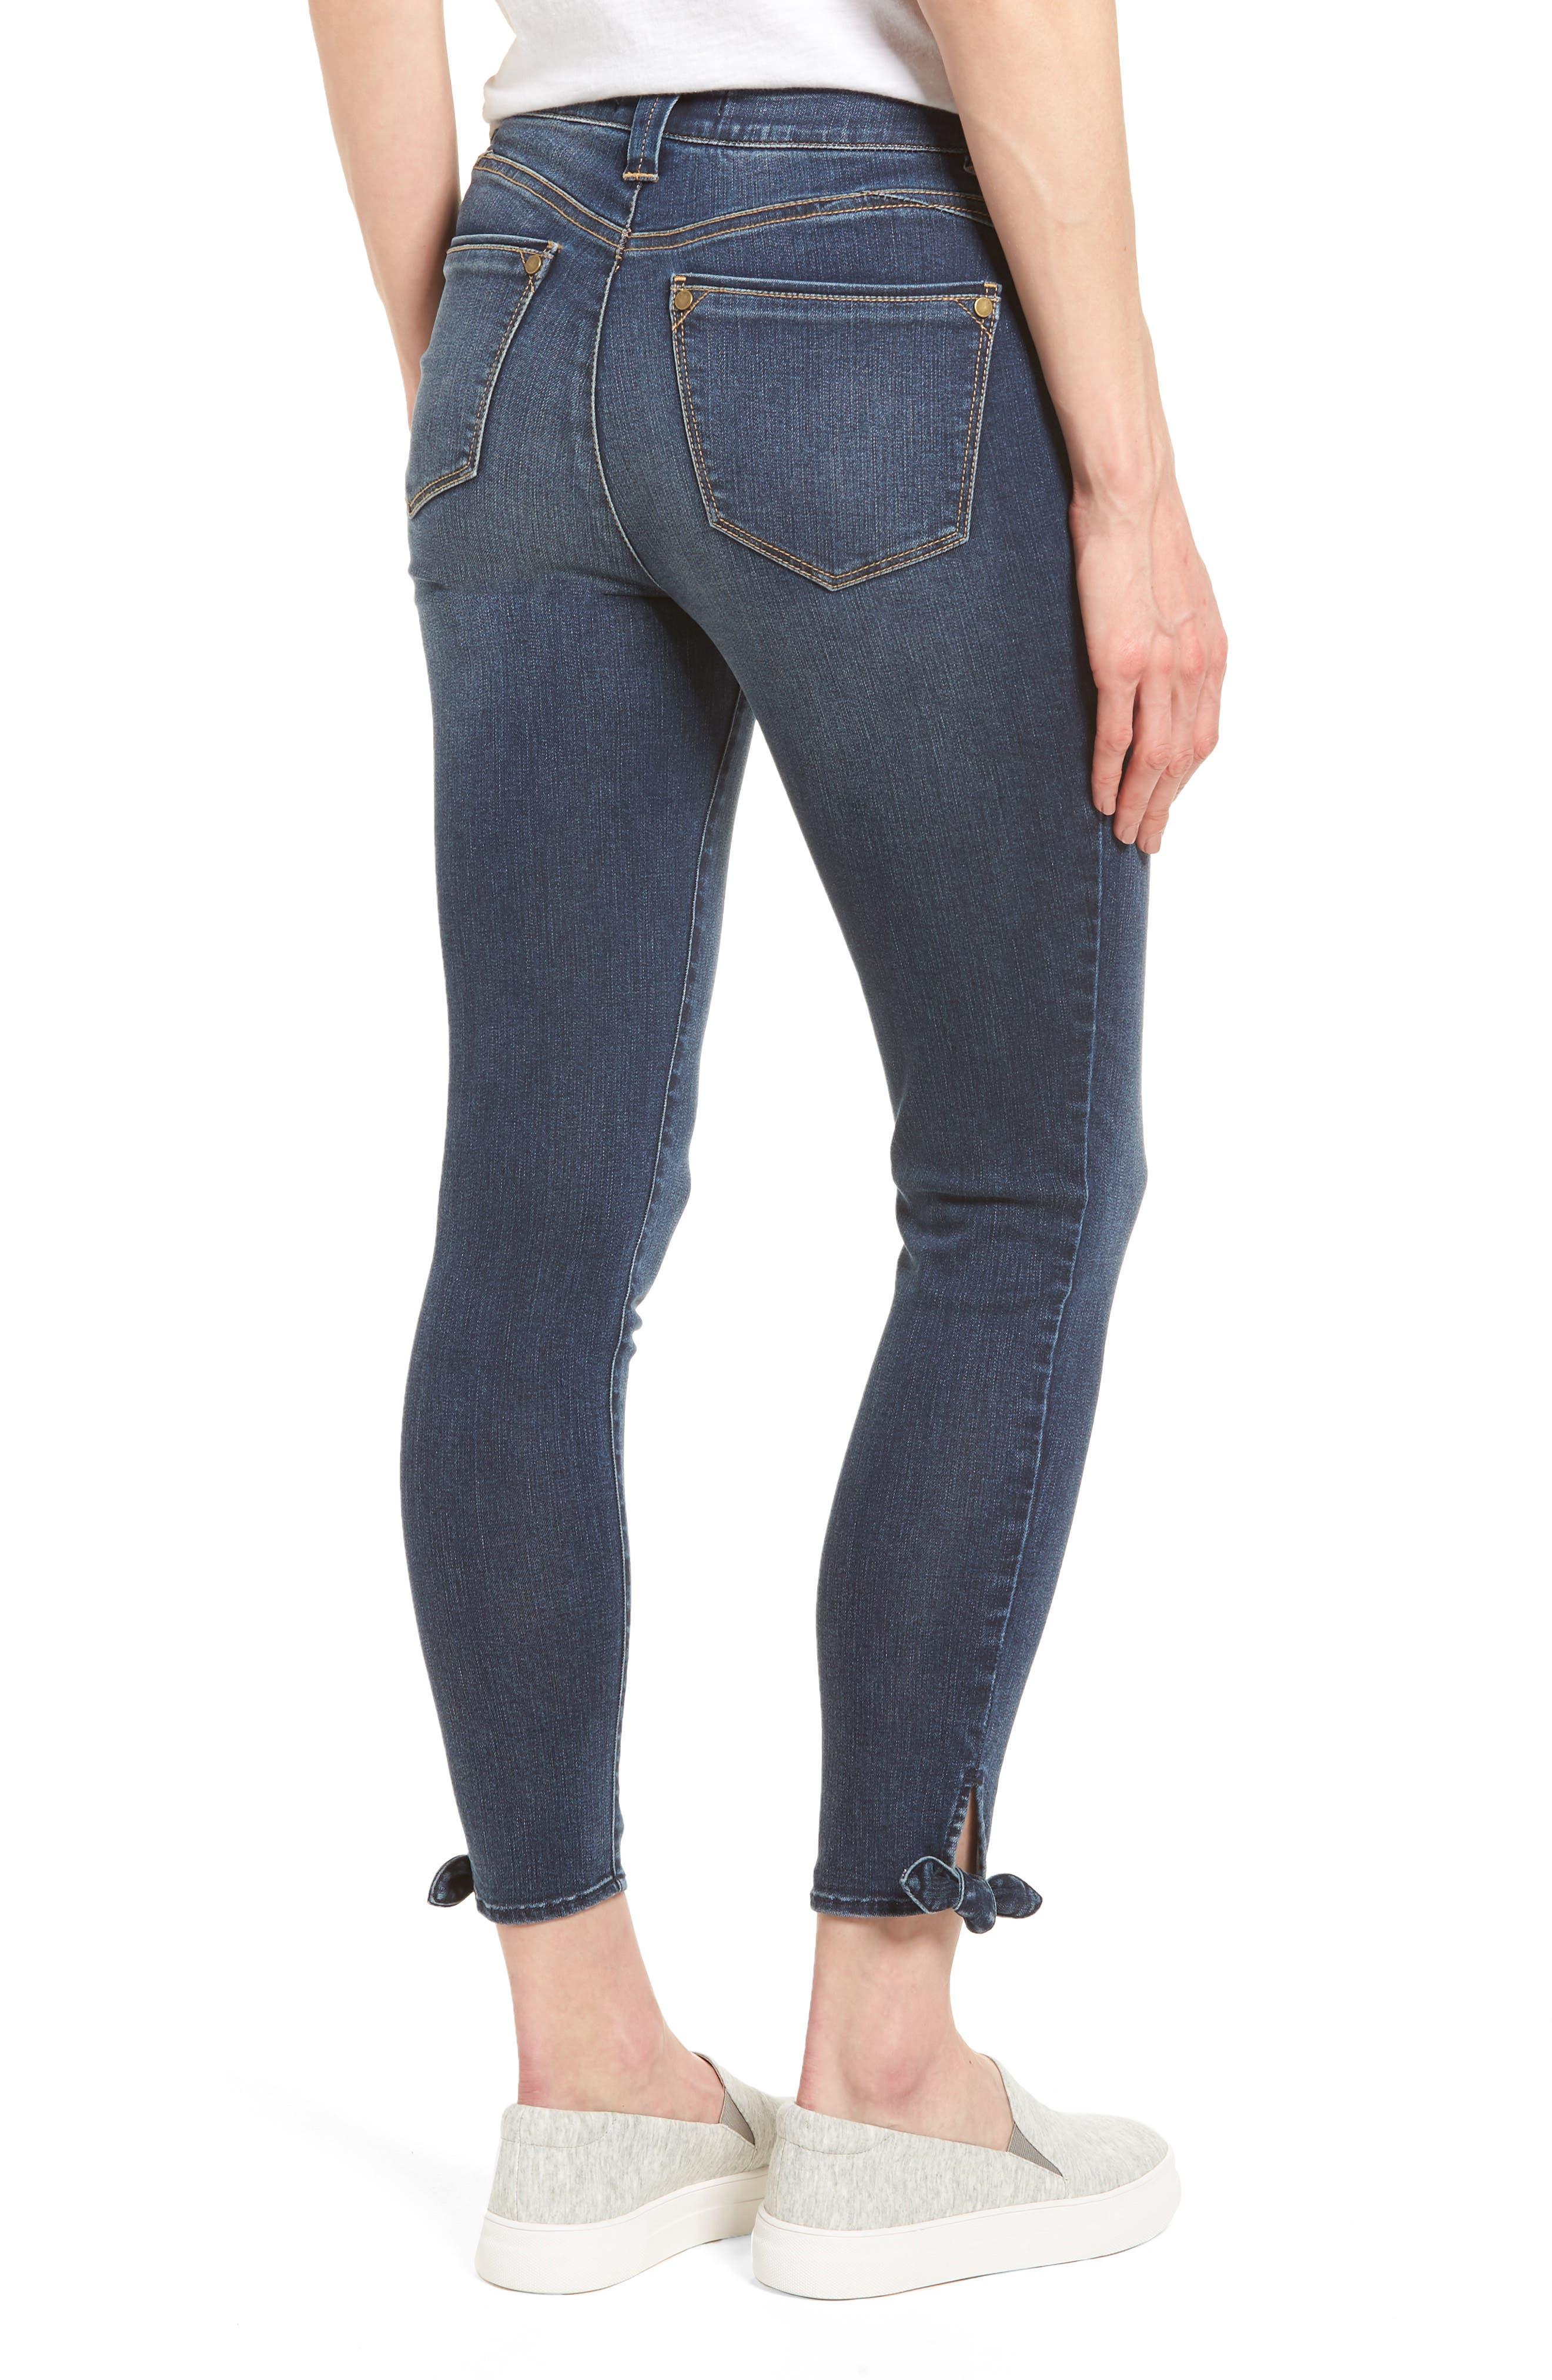 Ab-solution Ankle Skinny Skimmer Jeans,                             Alternate thumbnail 2, color,